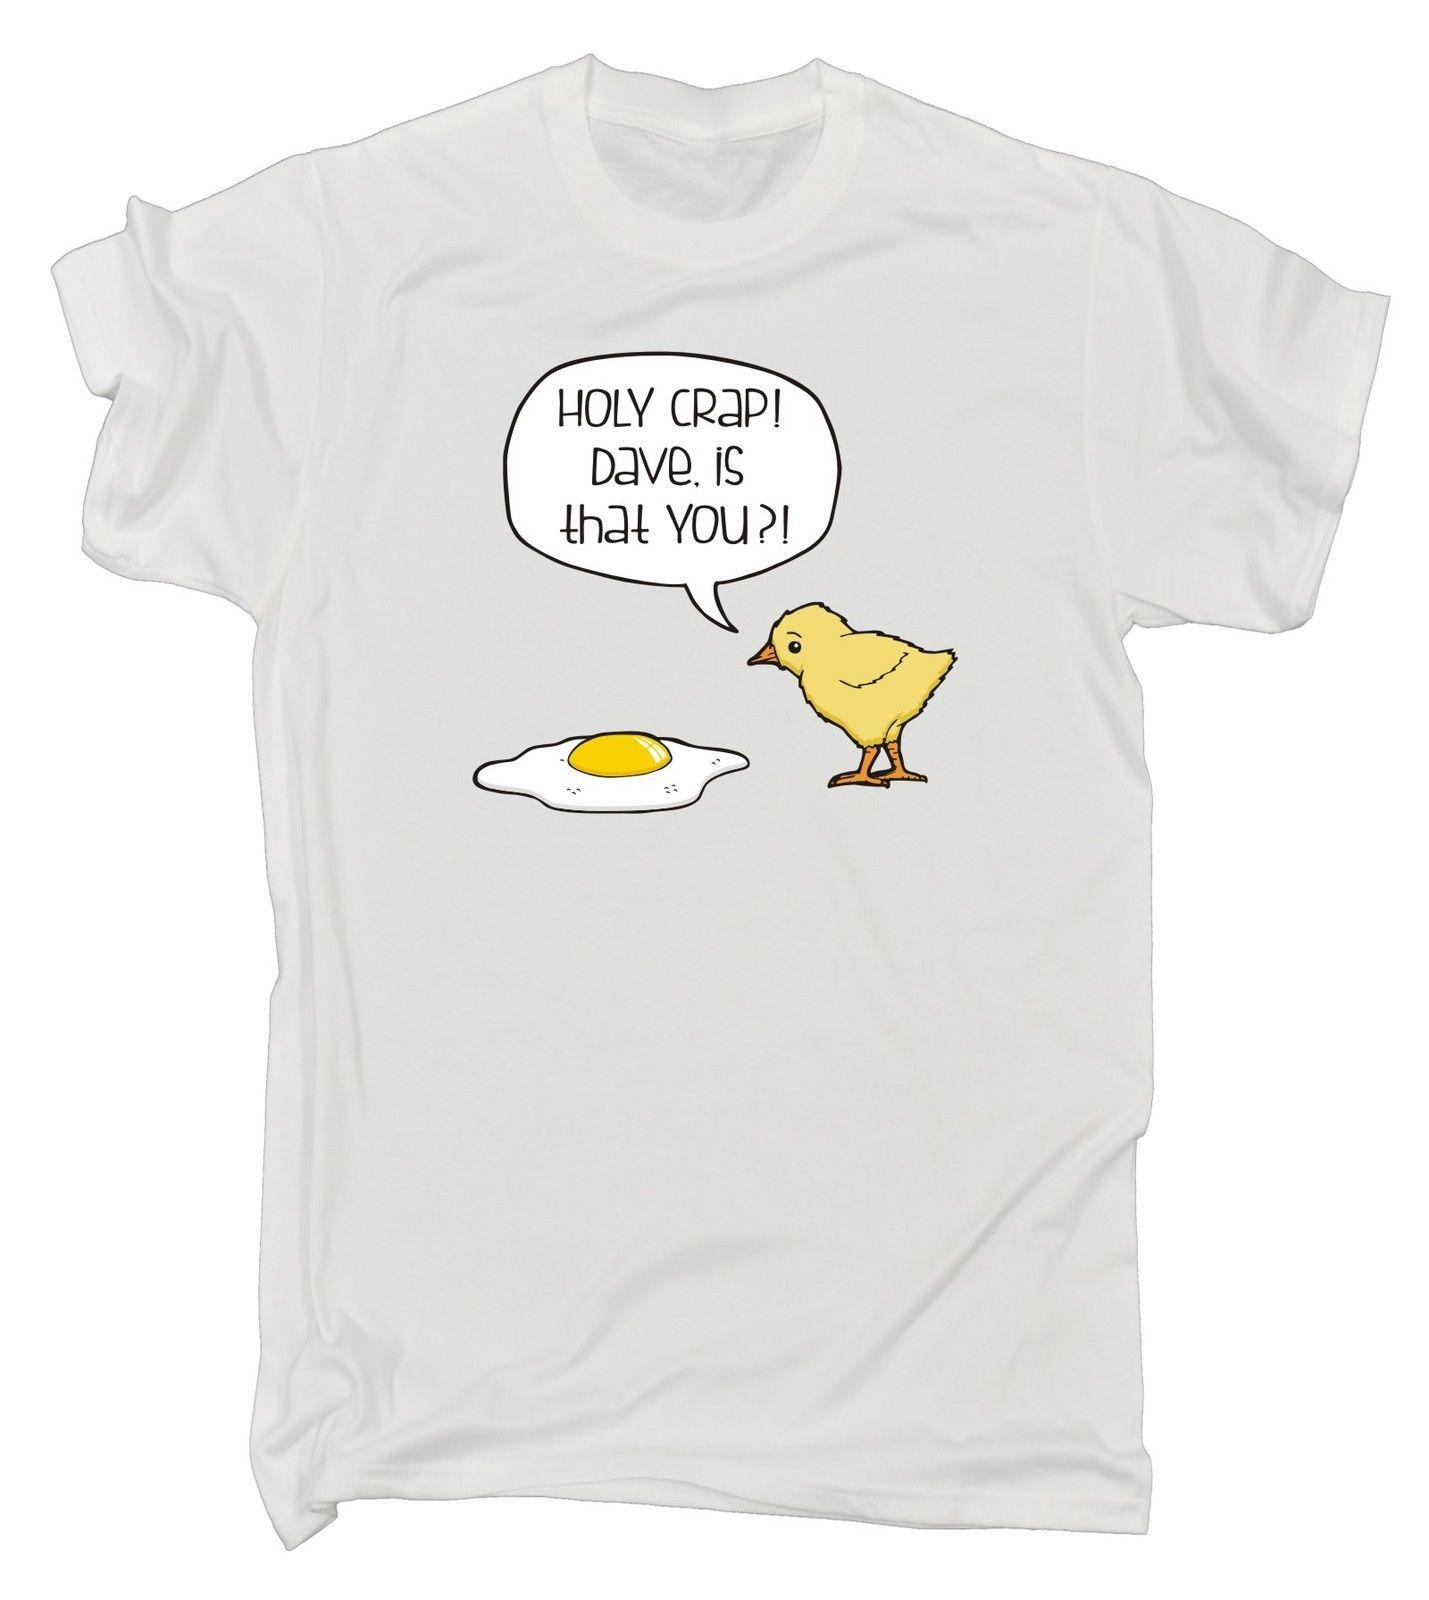 f2cd12102 Funny T Shirts Holy Crap! Dave Is That You T Shirt Shirts Tshirt Tee  Birthday Brand Shirts Jeans Print Mens Pride Dark T Shirt Online Shopping T  Shirt Cool ...